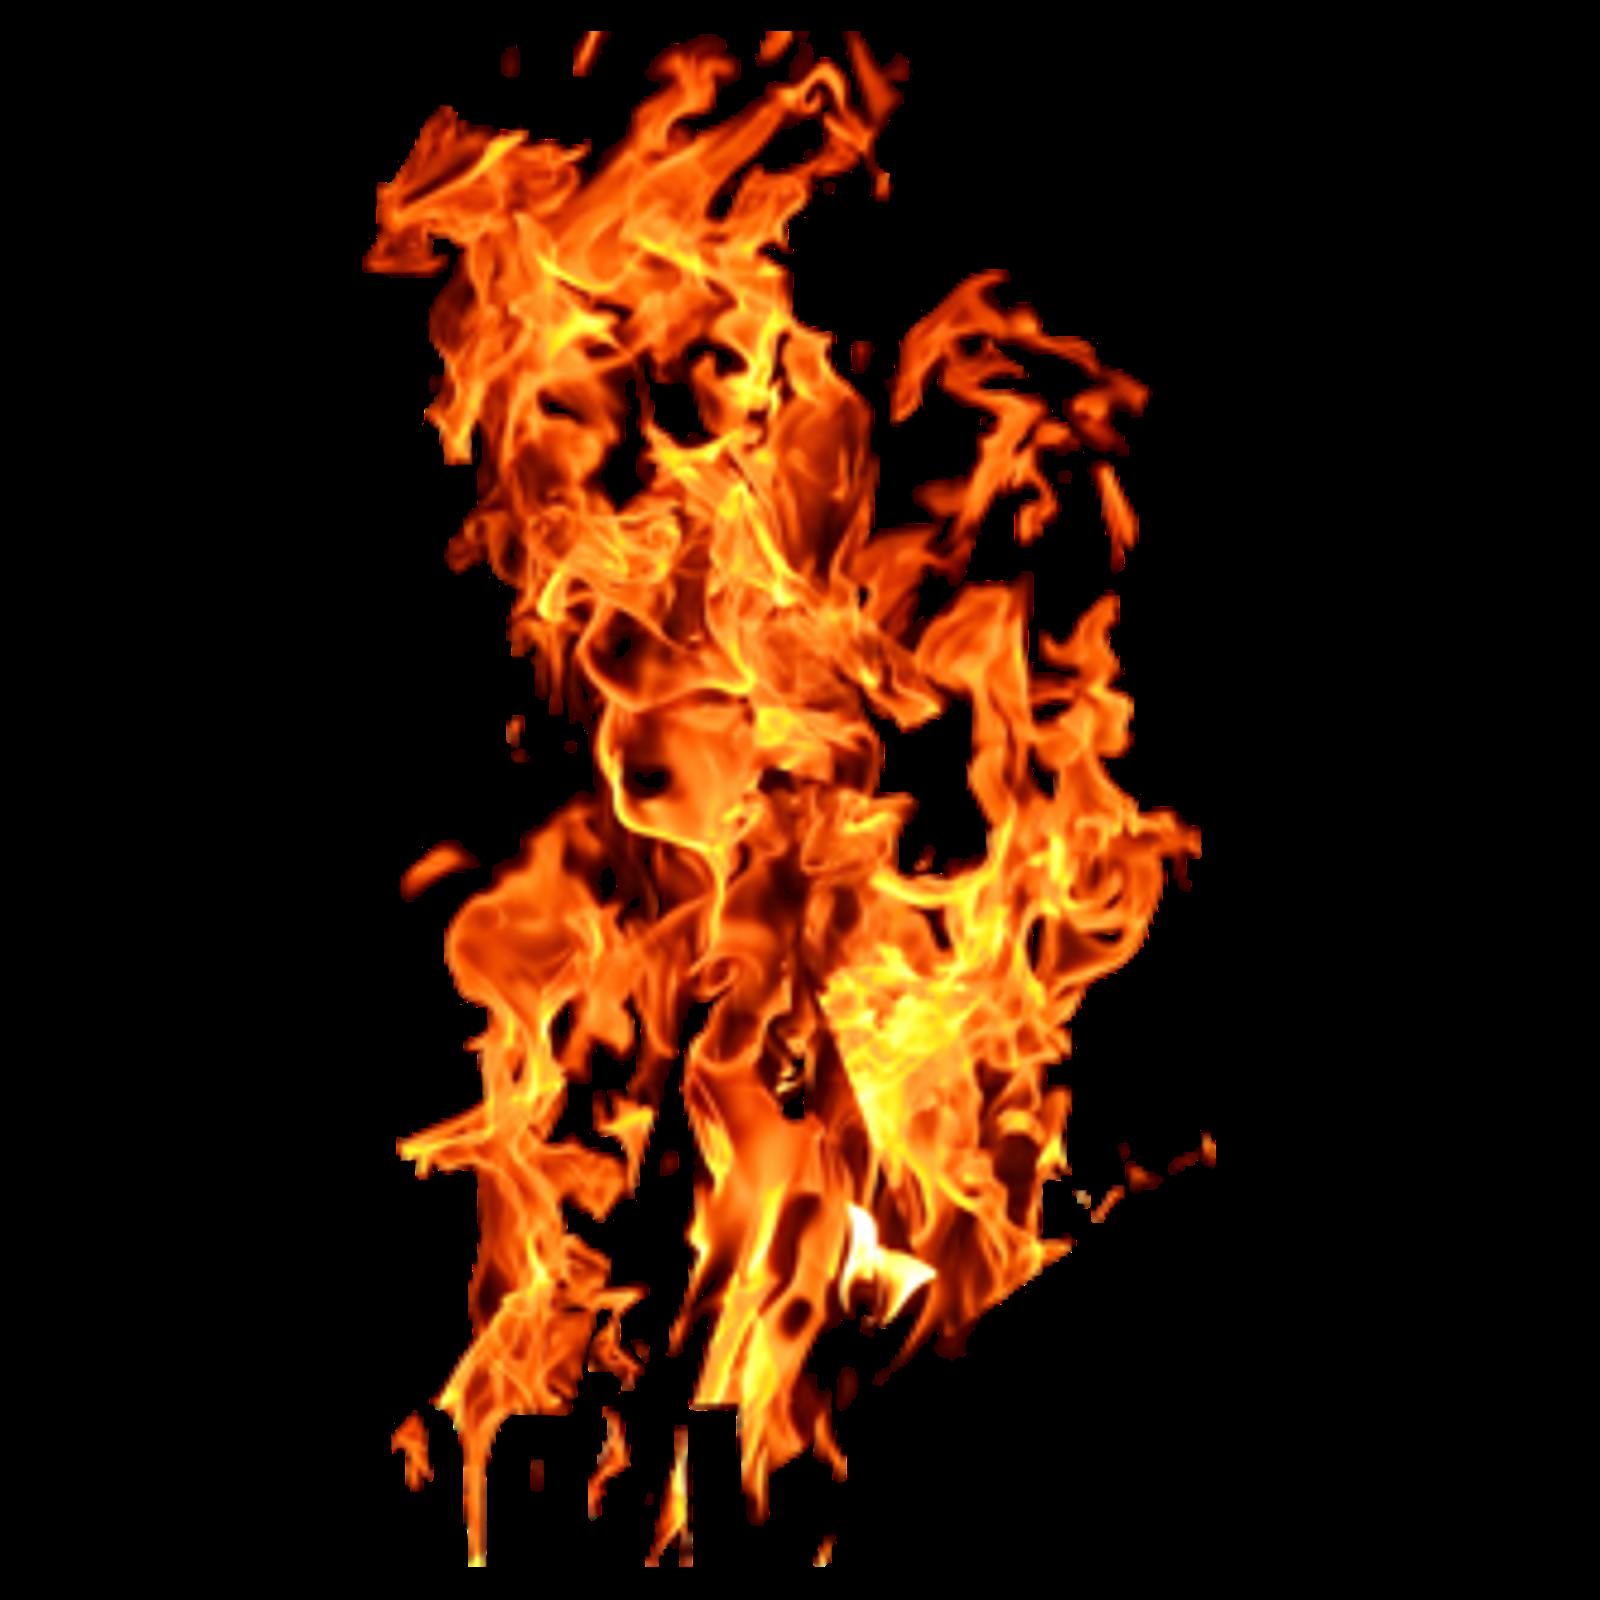 Match clipart fire spark. Clip art on transparent